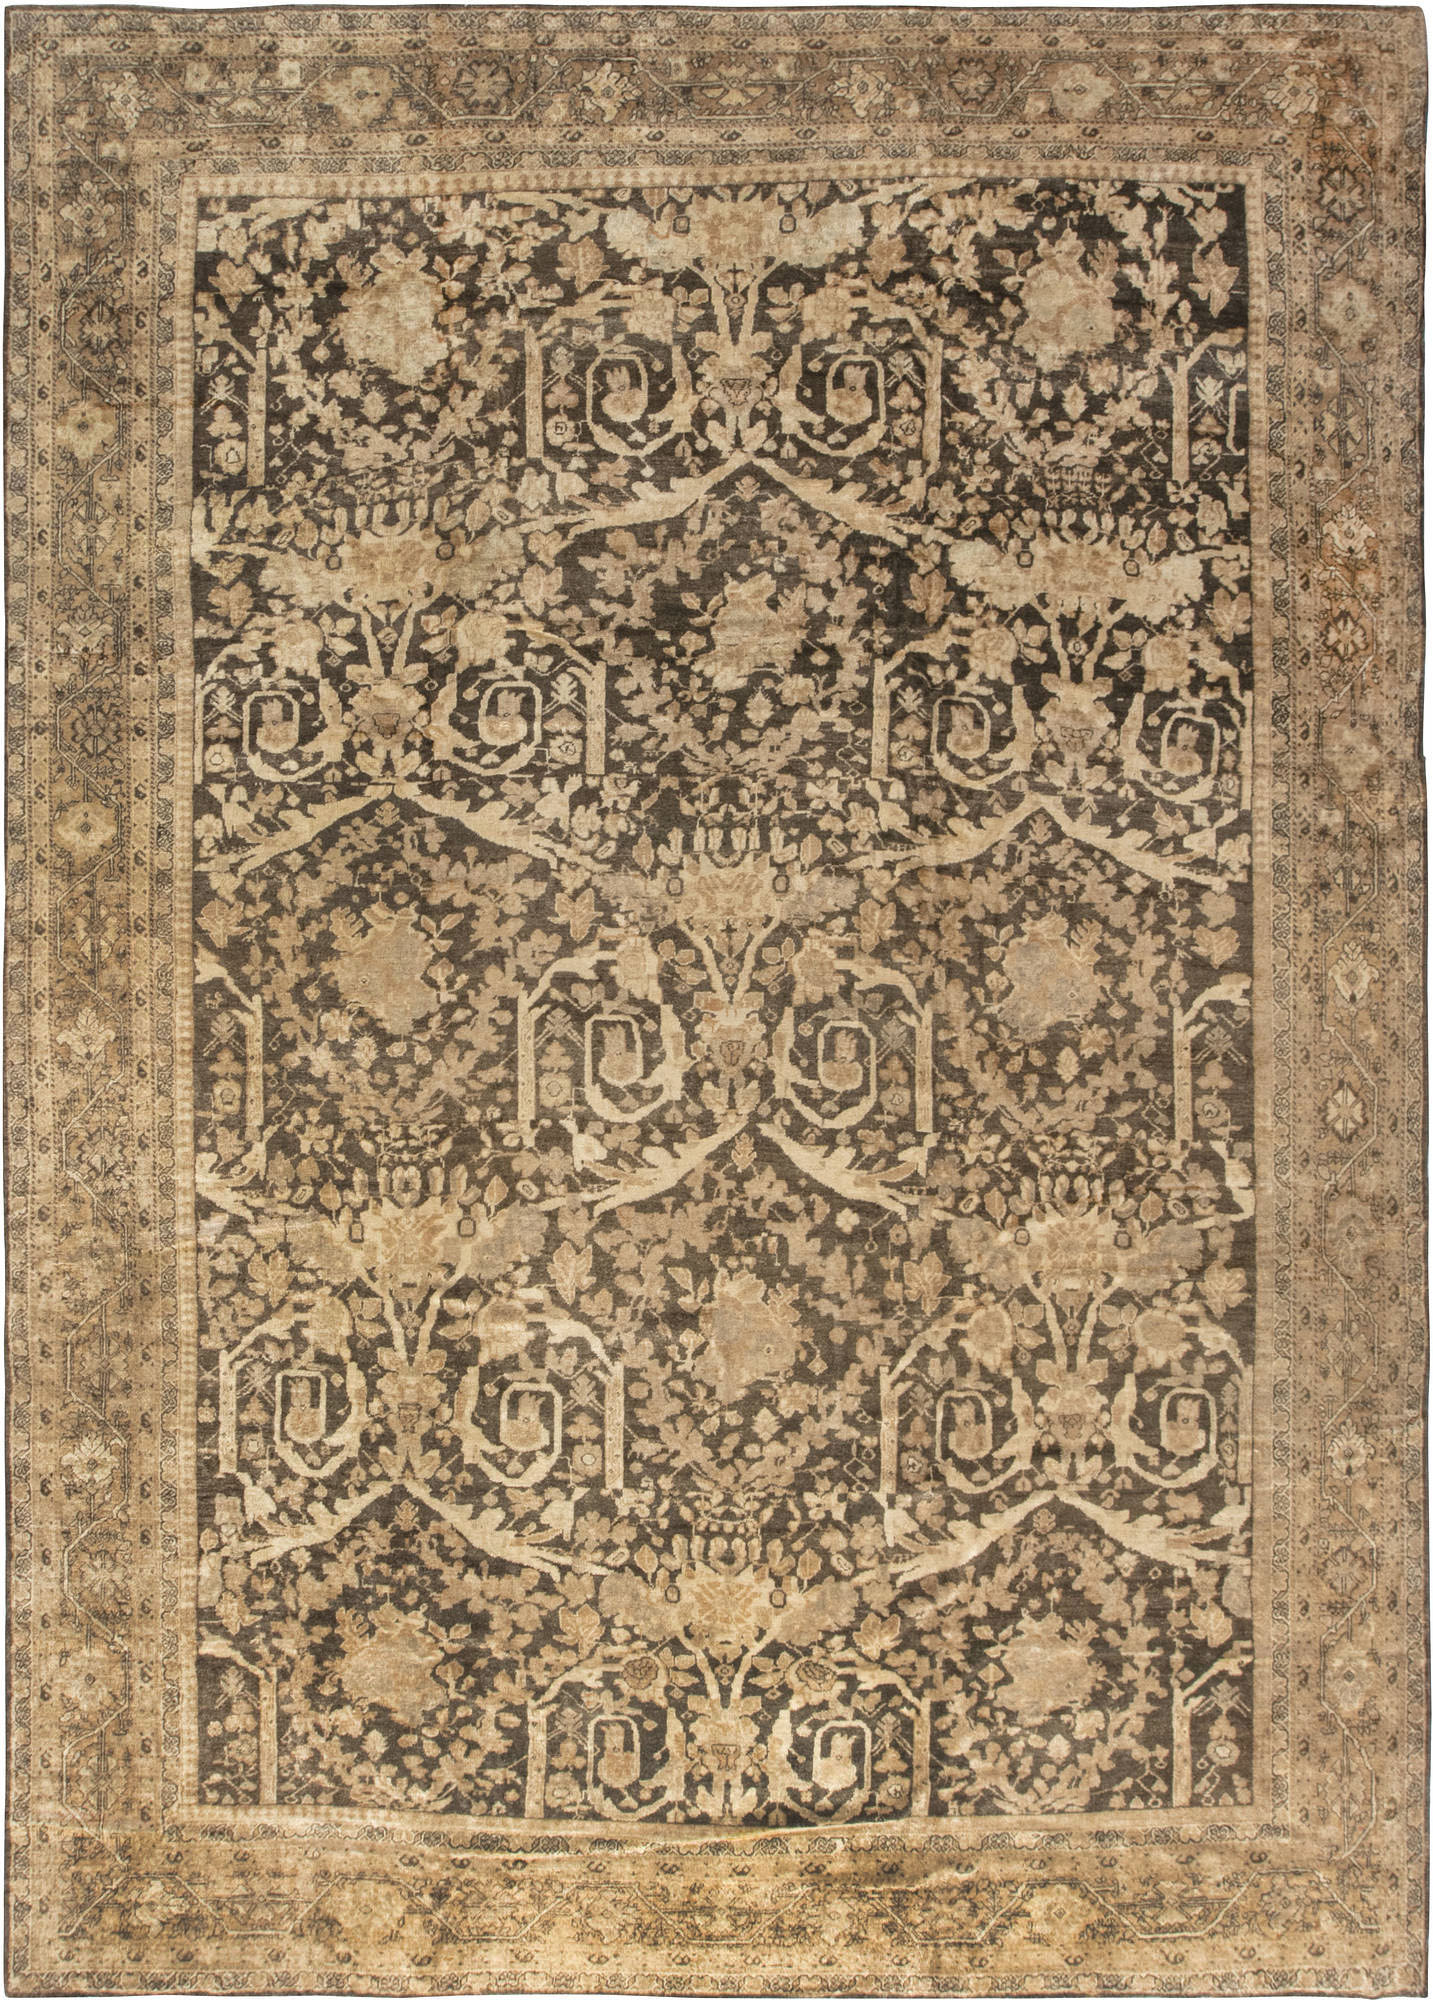 Antique Persian Sultanabad Carpet Bb6606